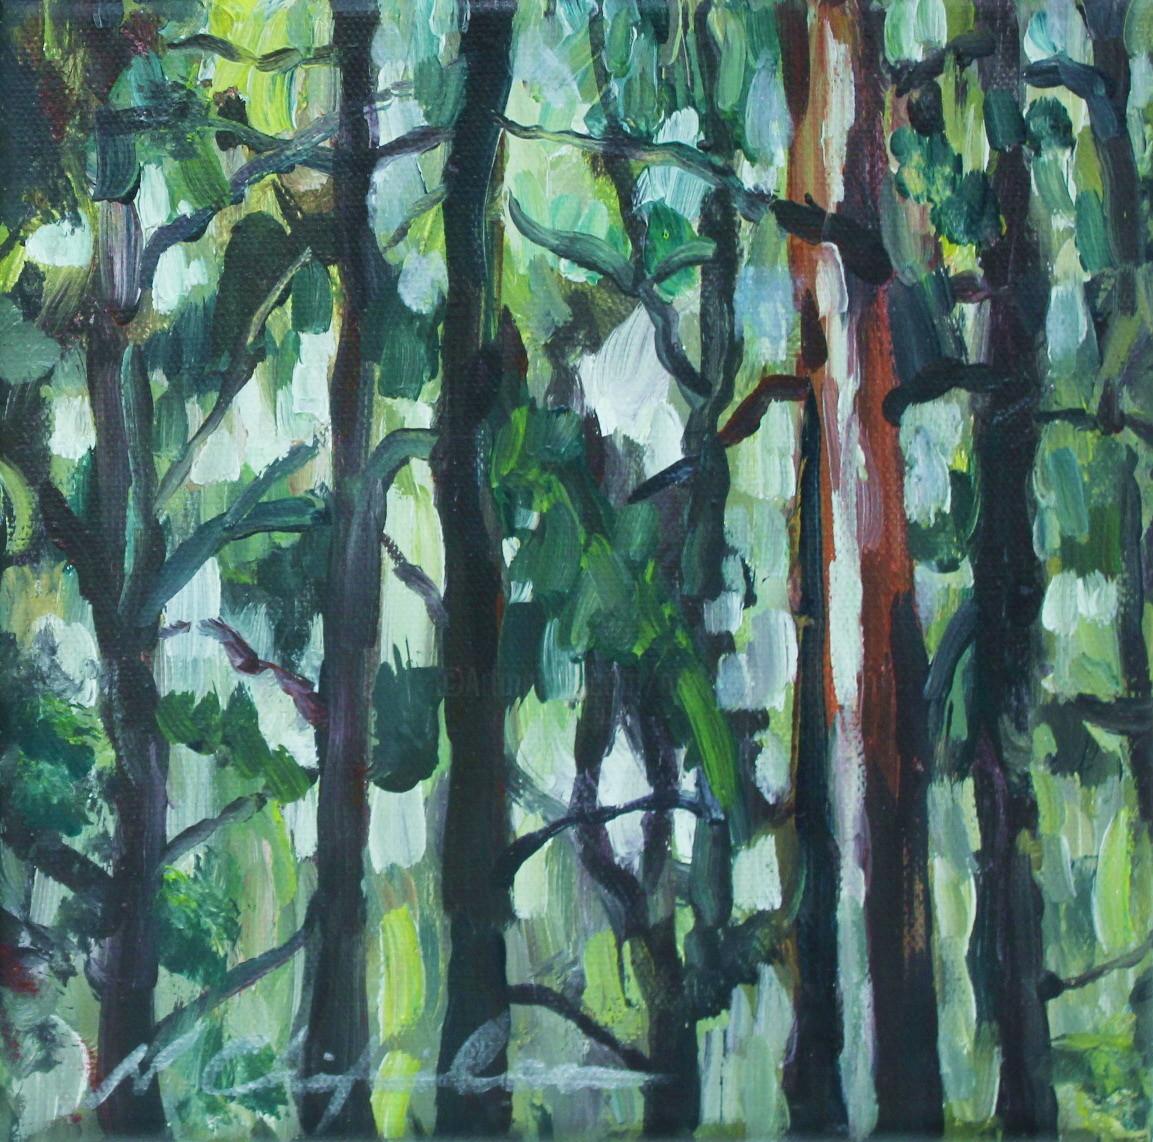 Nath Chipilova (Atelier NN art store) - Into the wood 4